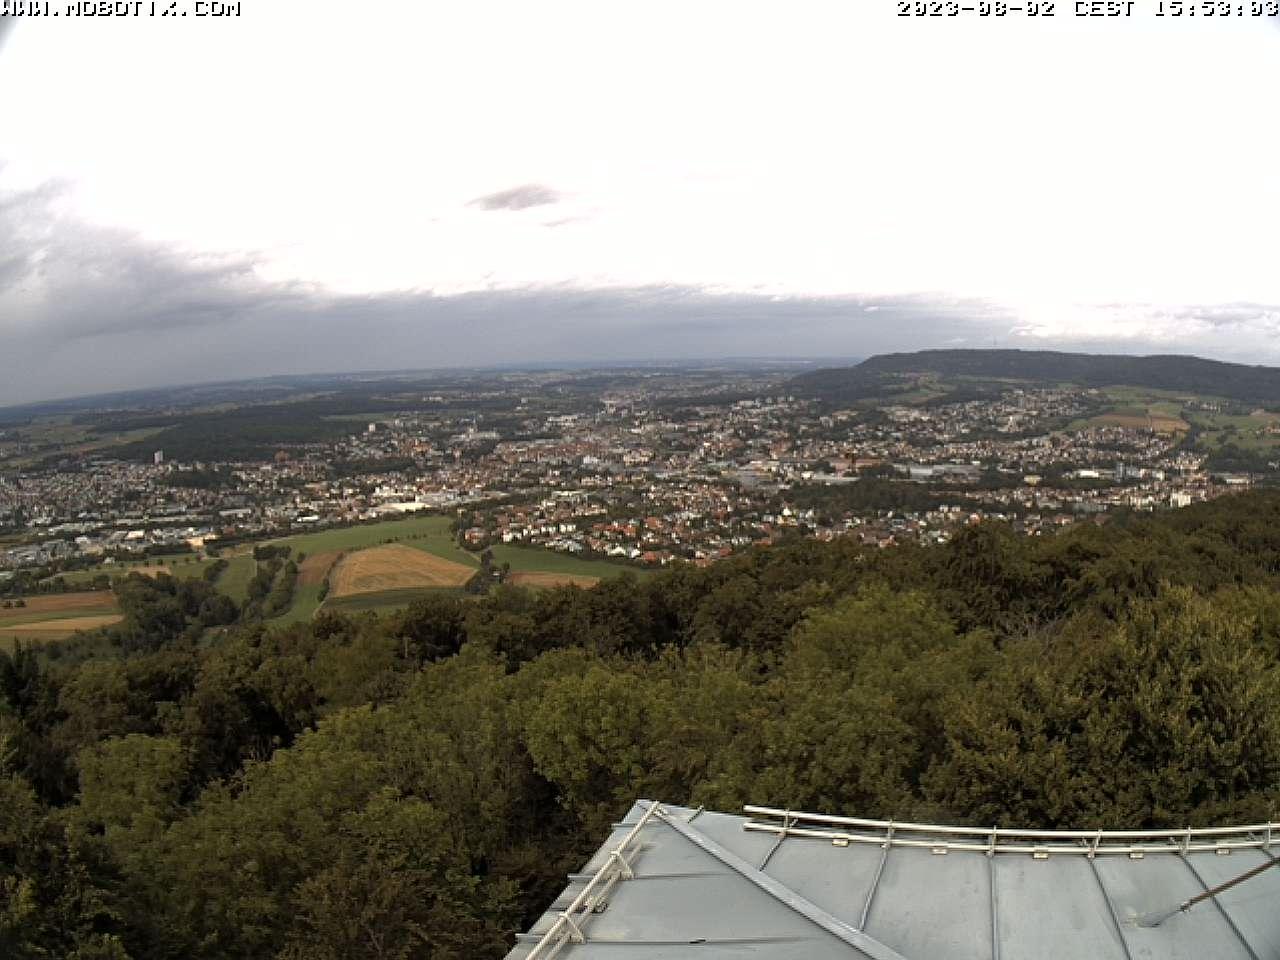 Webcam Skigebiet Aalen - Hirtenteich Panorama - Schw�bische Alb